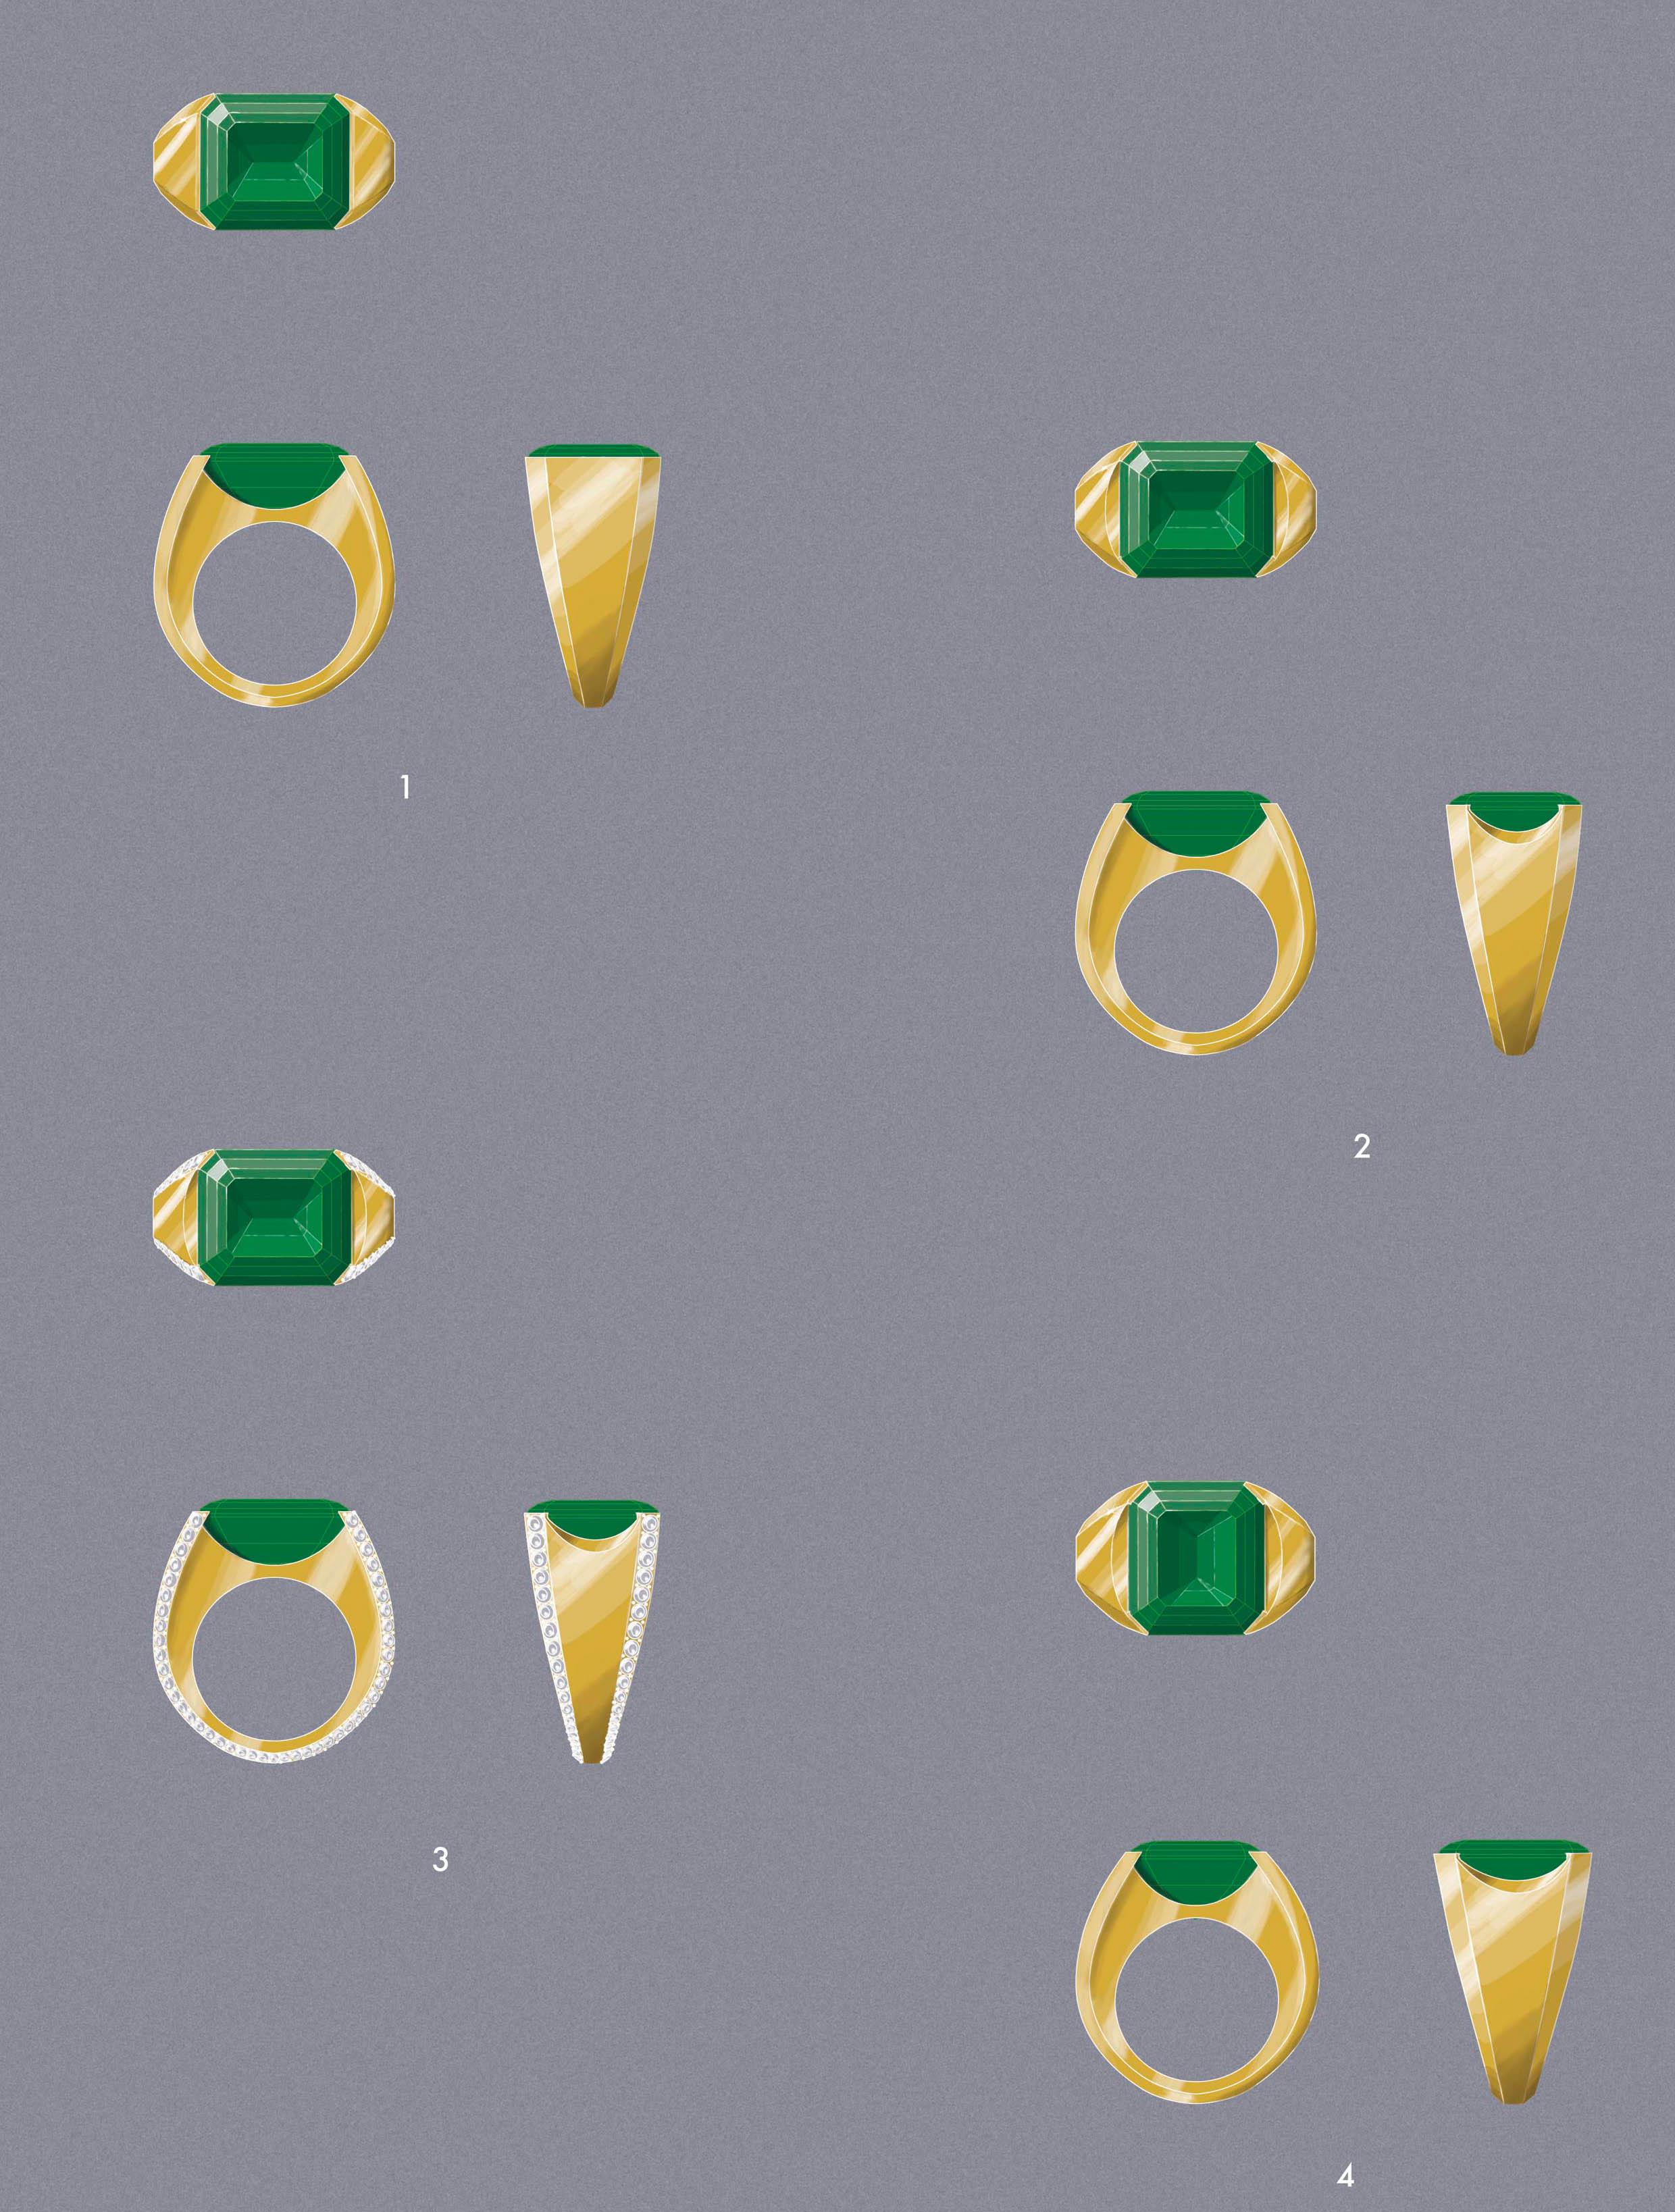 Man's Emerald Cut Emerald Ring Designs